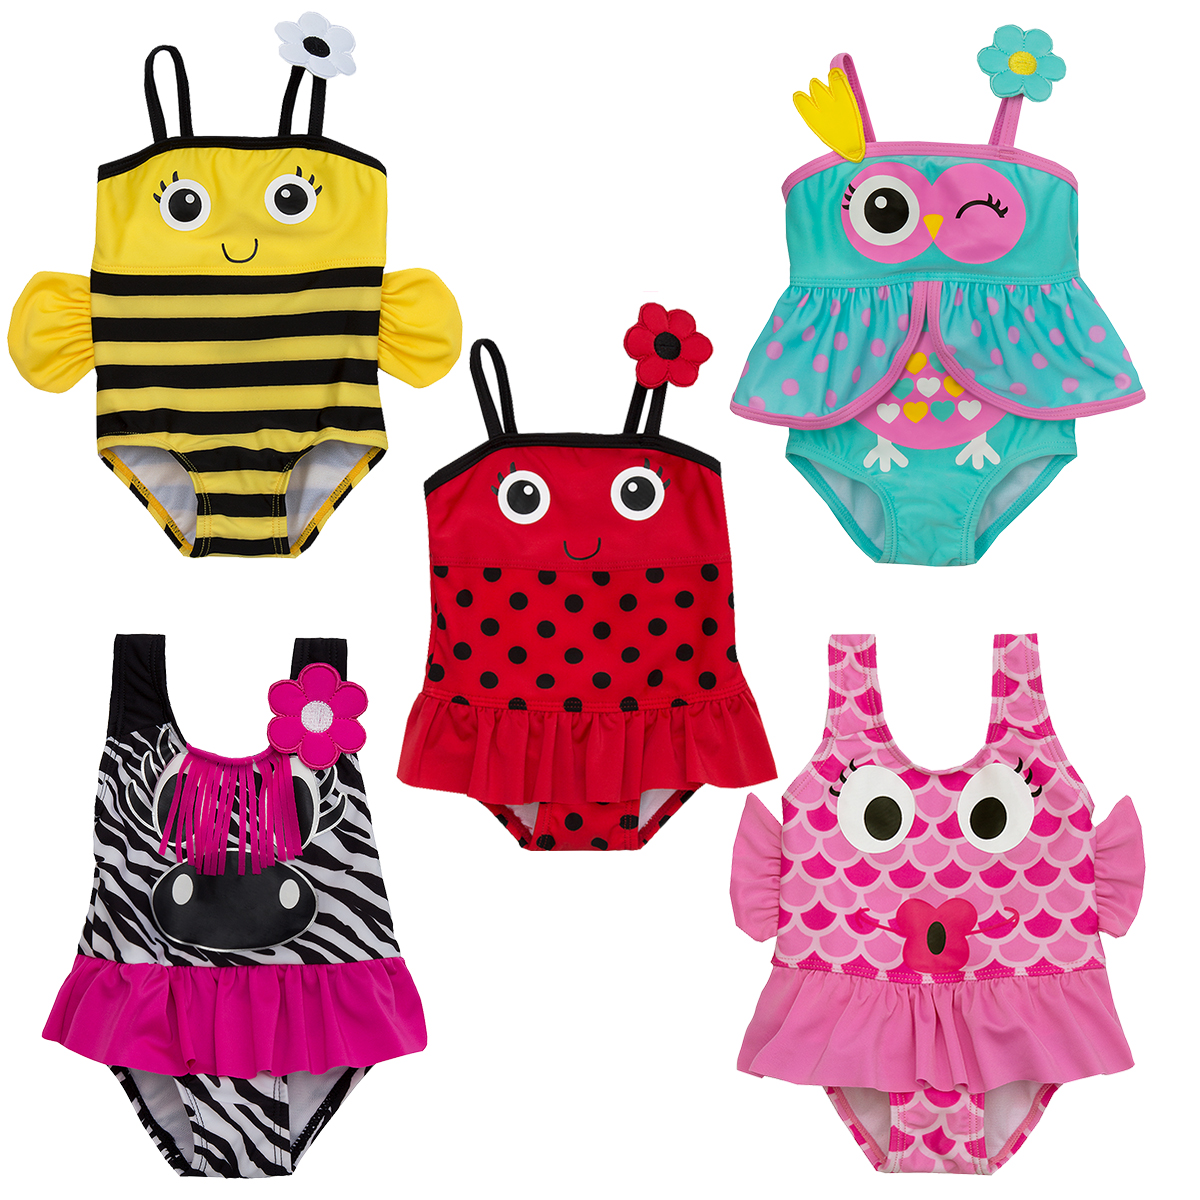 85c6d535cd5ad Baby Girls Swimwear Novelty Swim Bathing Suit Swimming Beach Costume Fun  Outfit